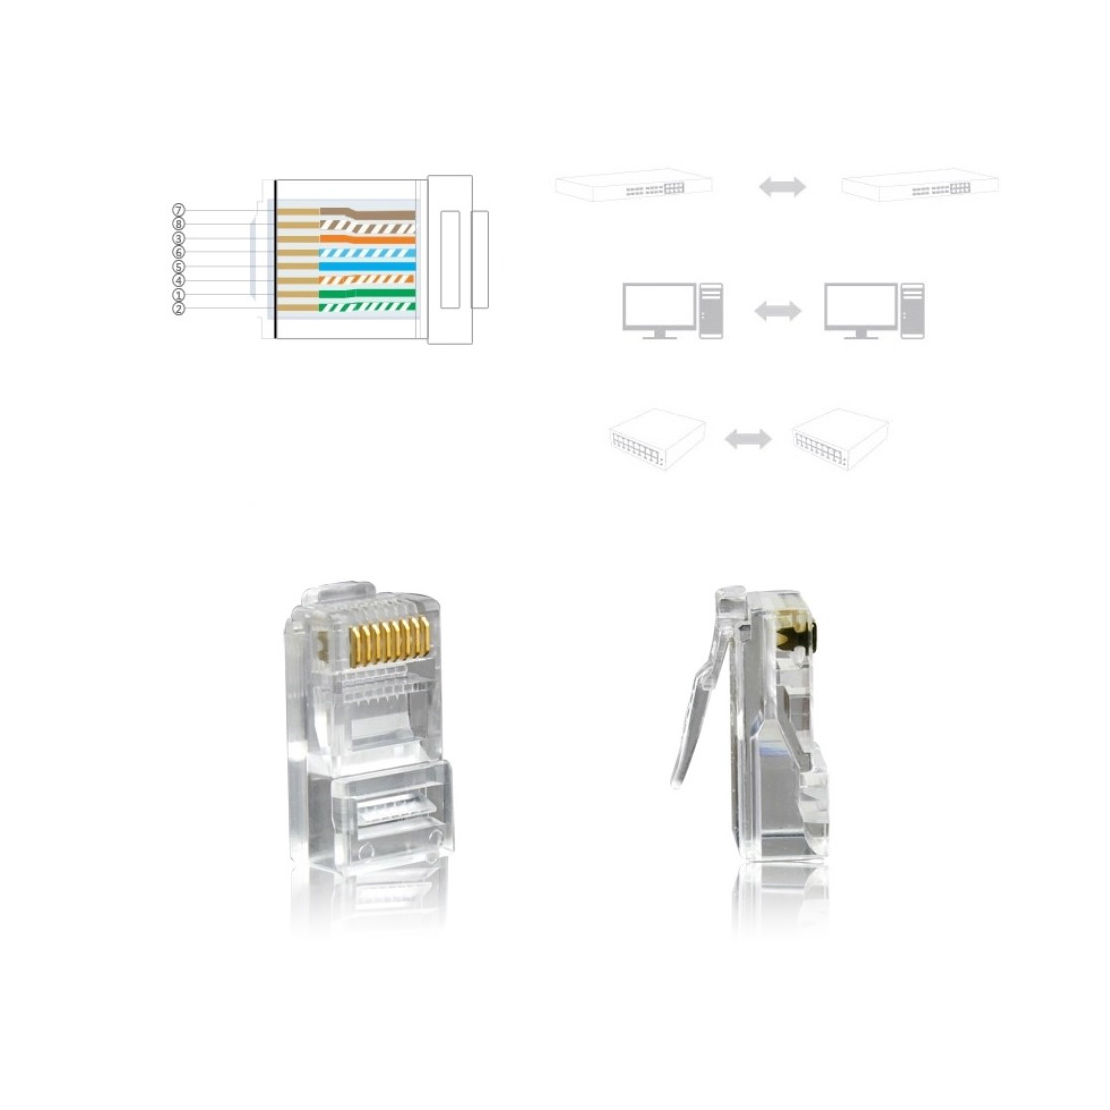 50pcs Rj45 Modular Network Cable Lan Connector Plug End